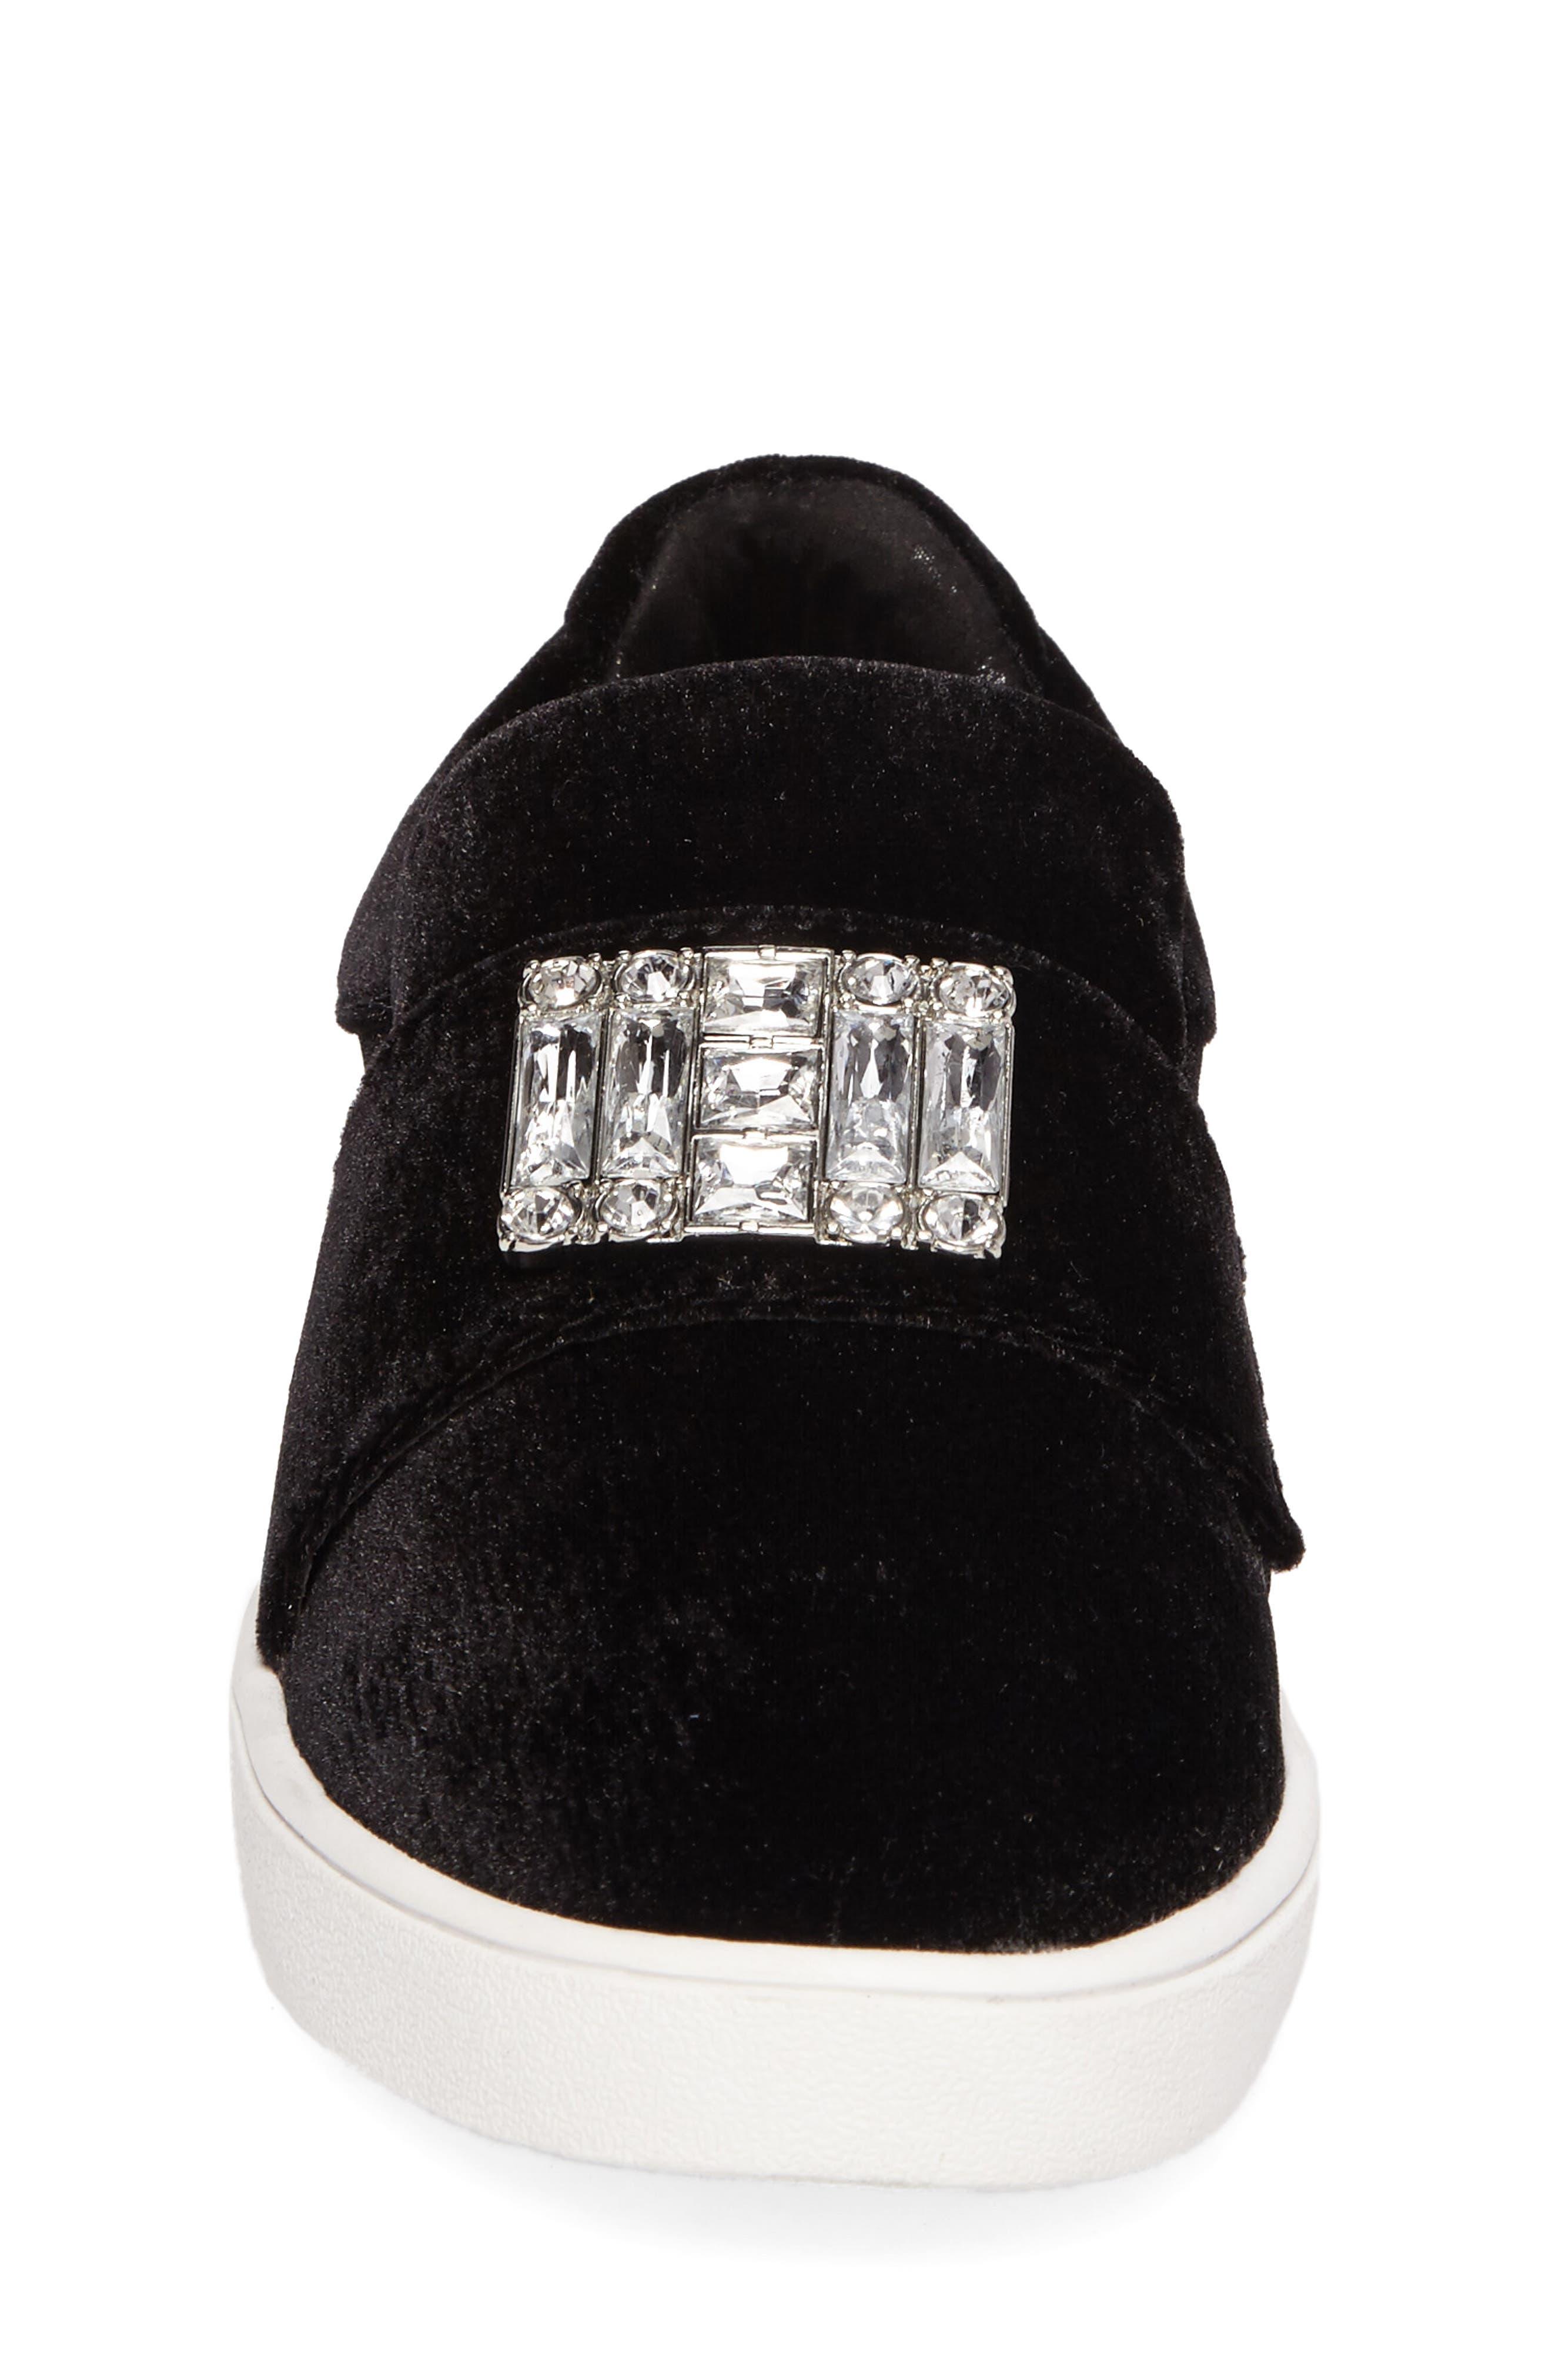 Ivy Dream Embellished Slip-On Sneaker,                             Alternate thumbnail 4, color,                             001